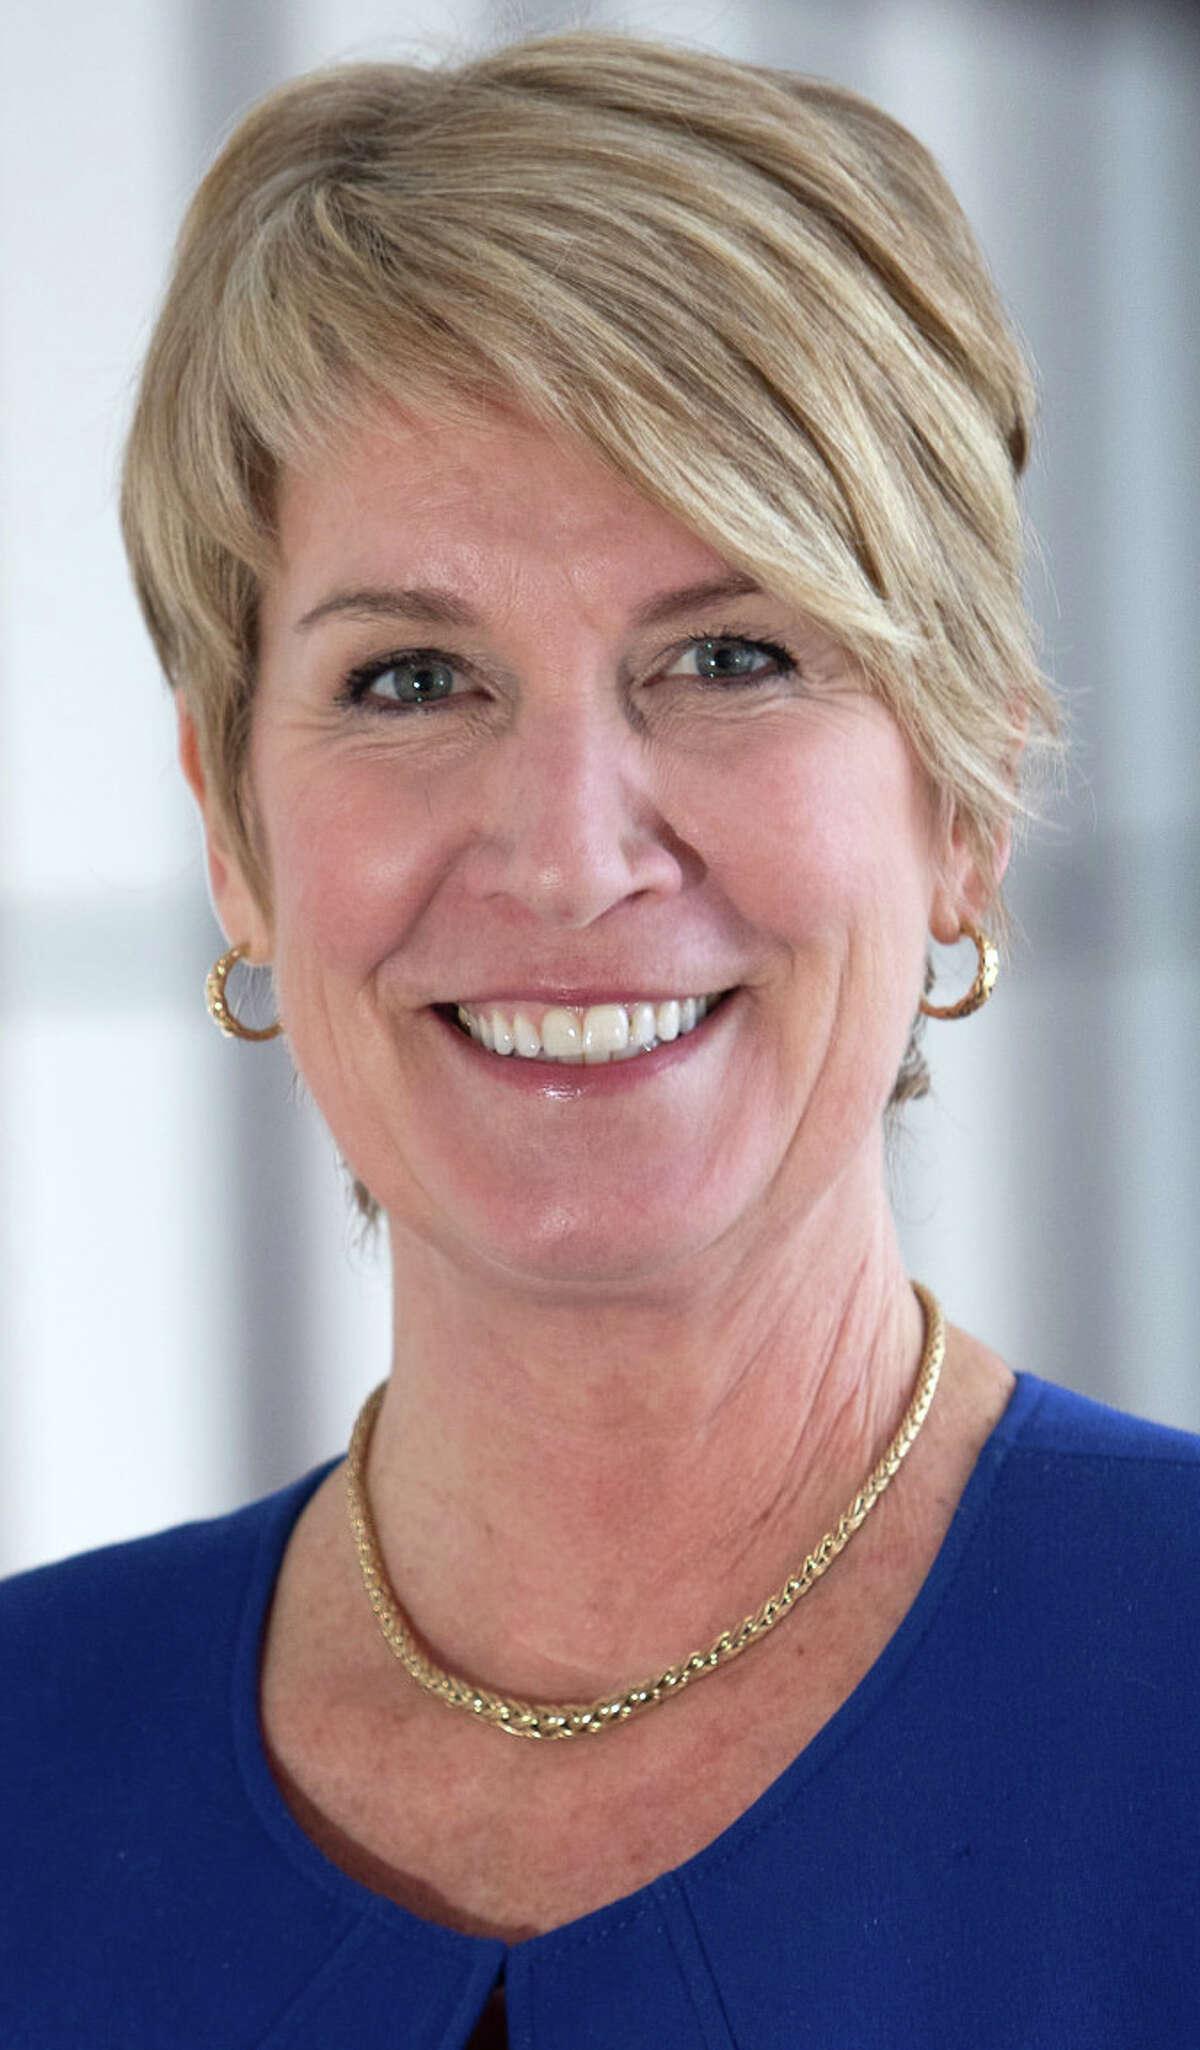 State Rep. Laura Devlin